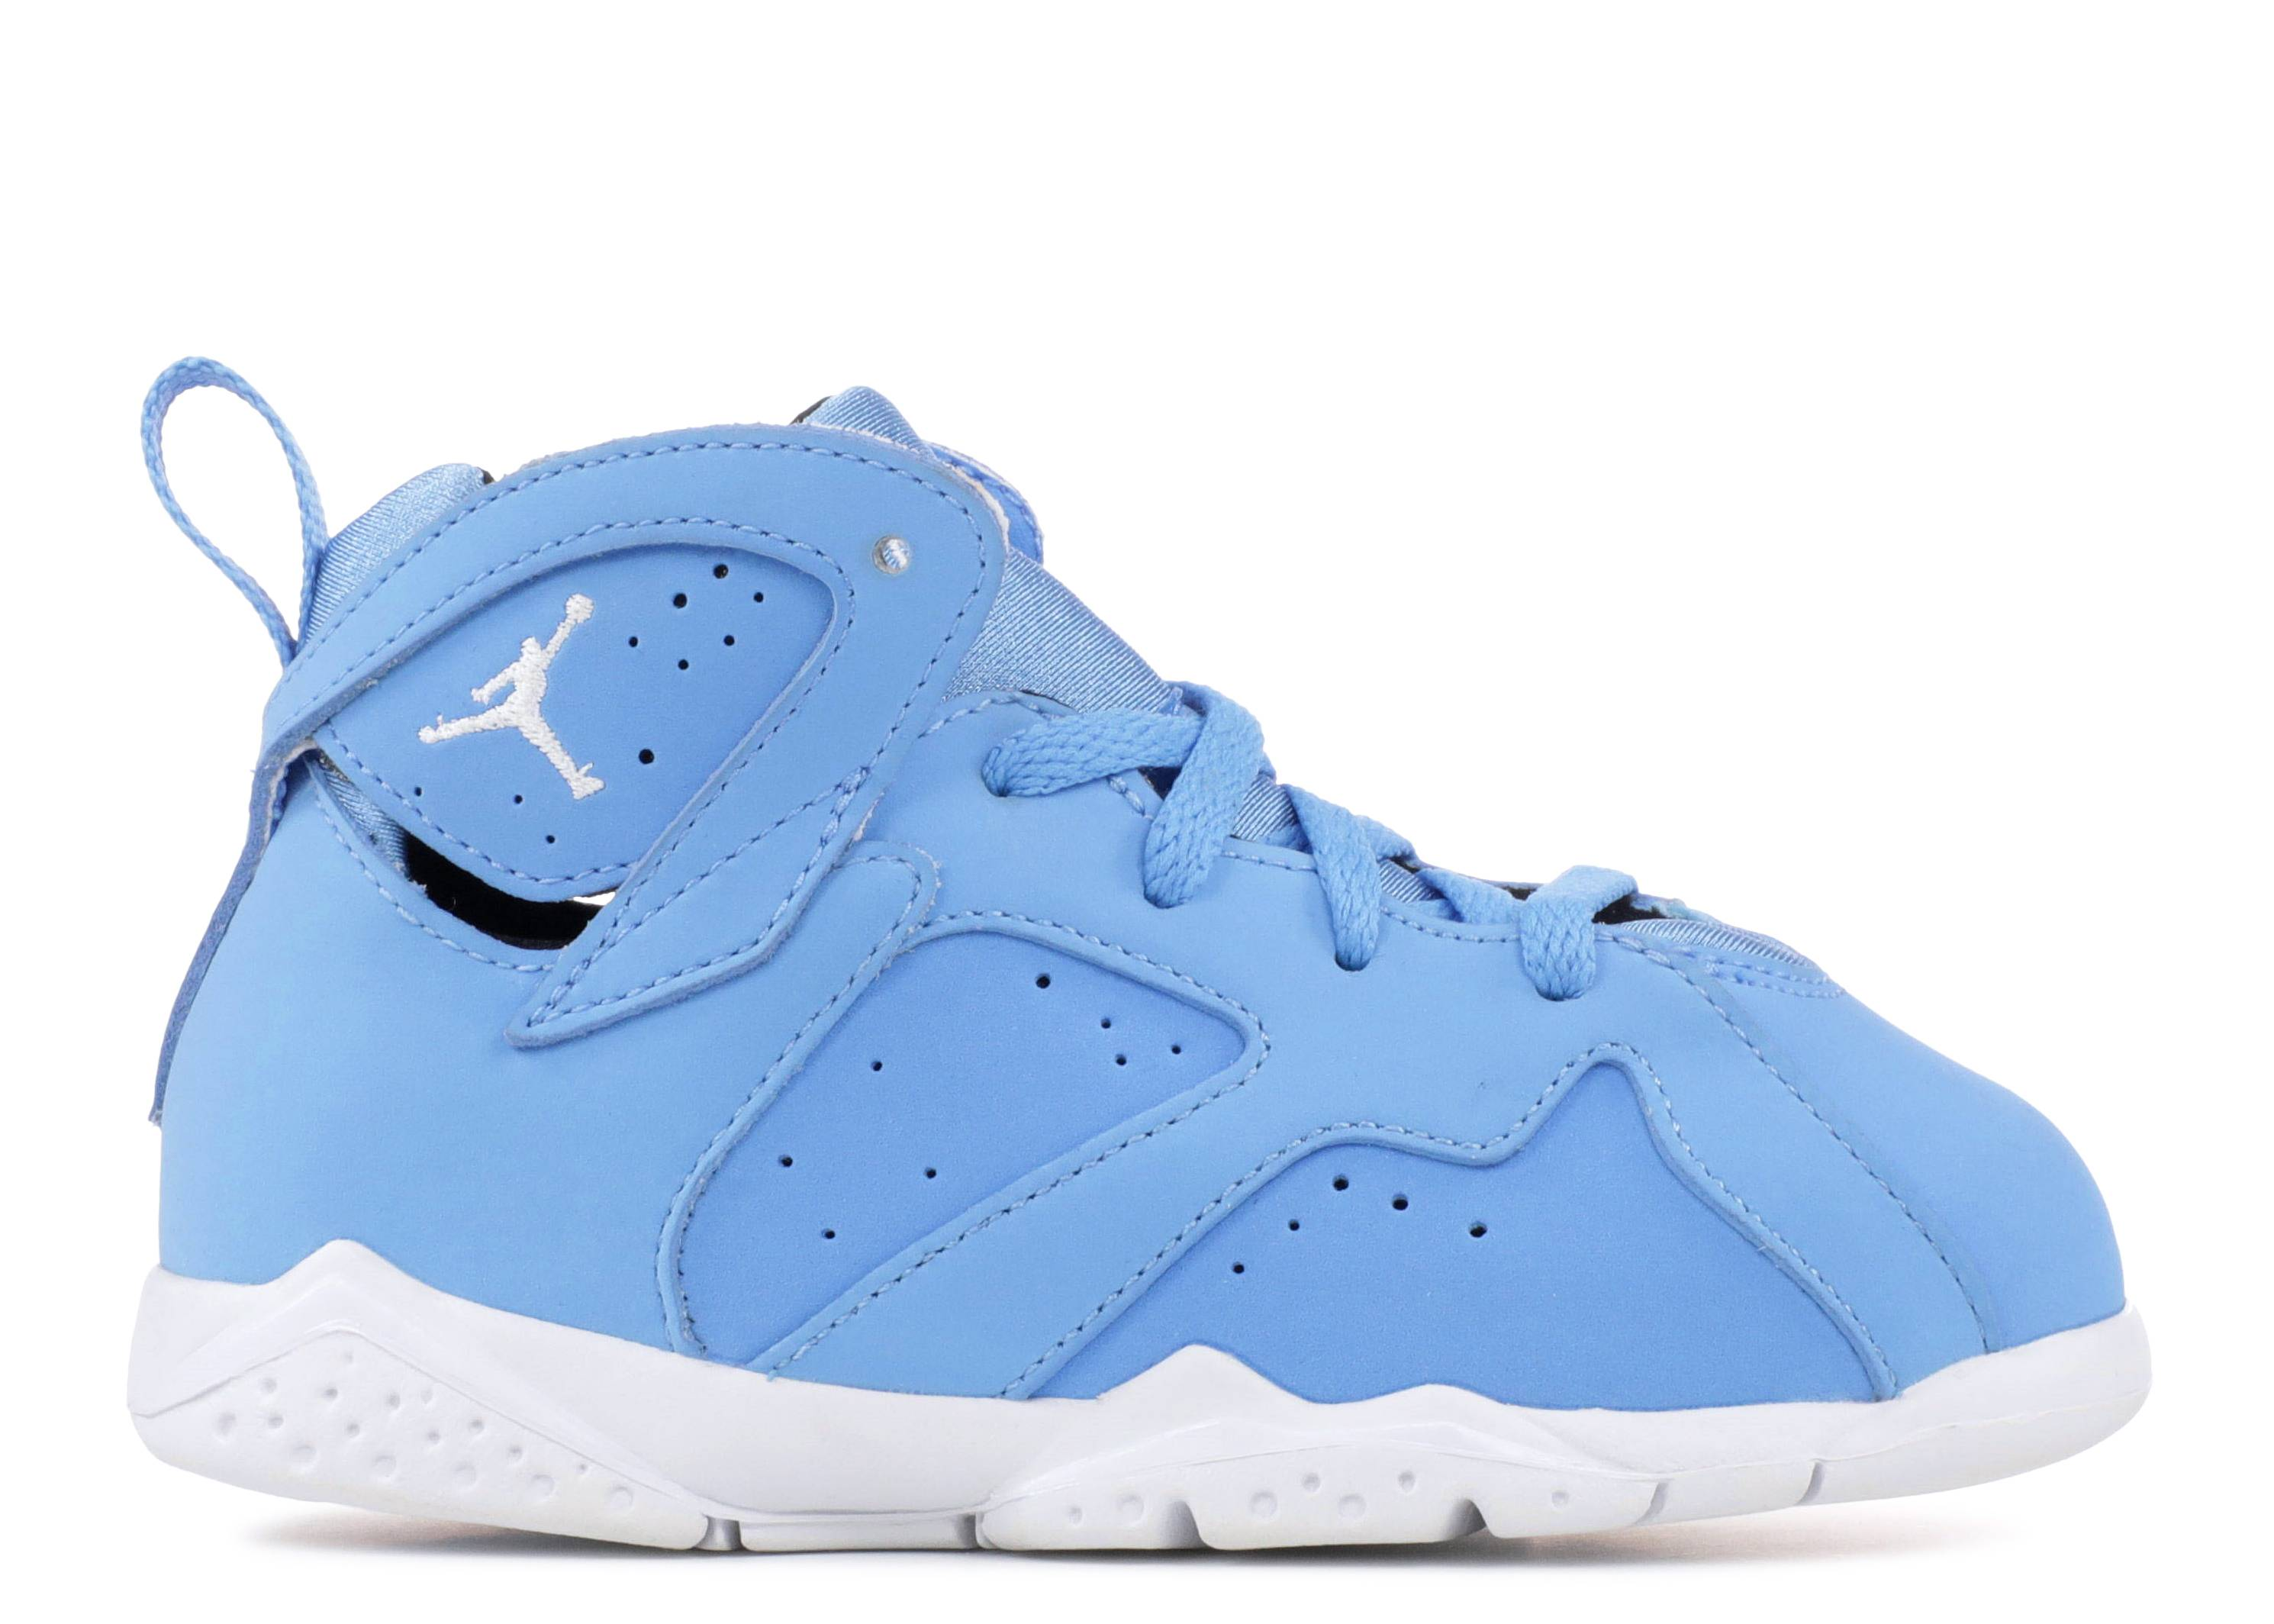 eb740d430c7614 Air Jordan 7 (VII) Shoes - Nike